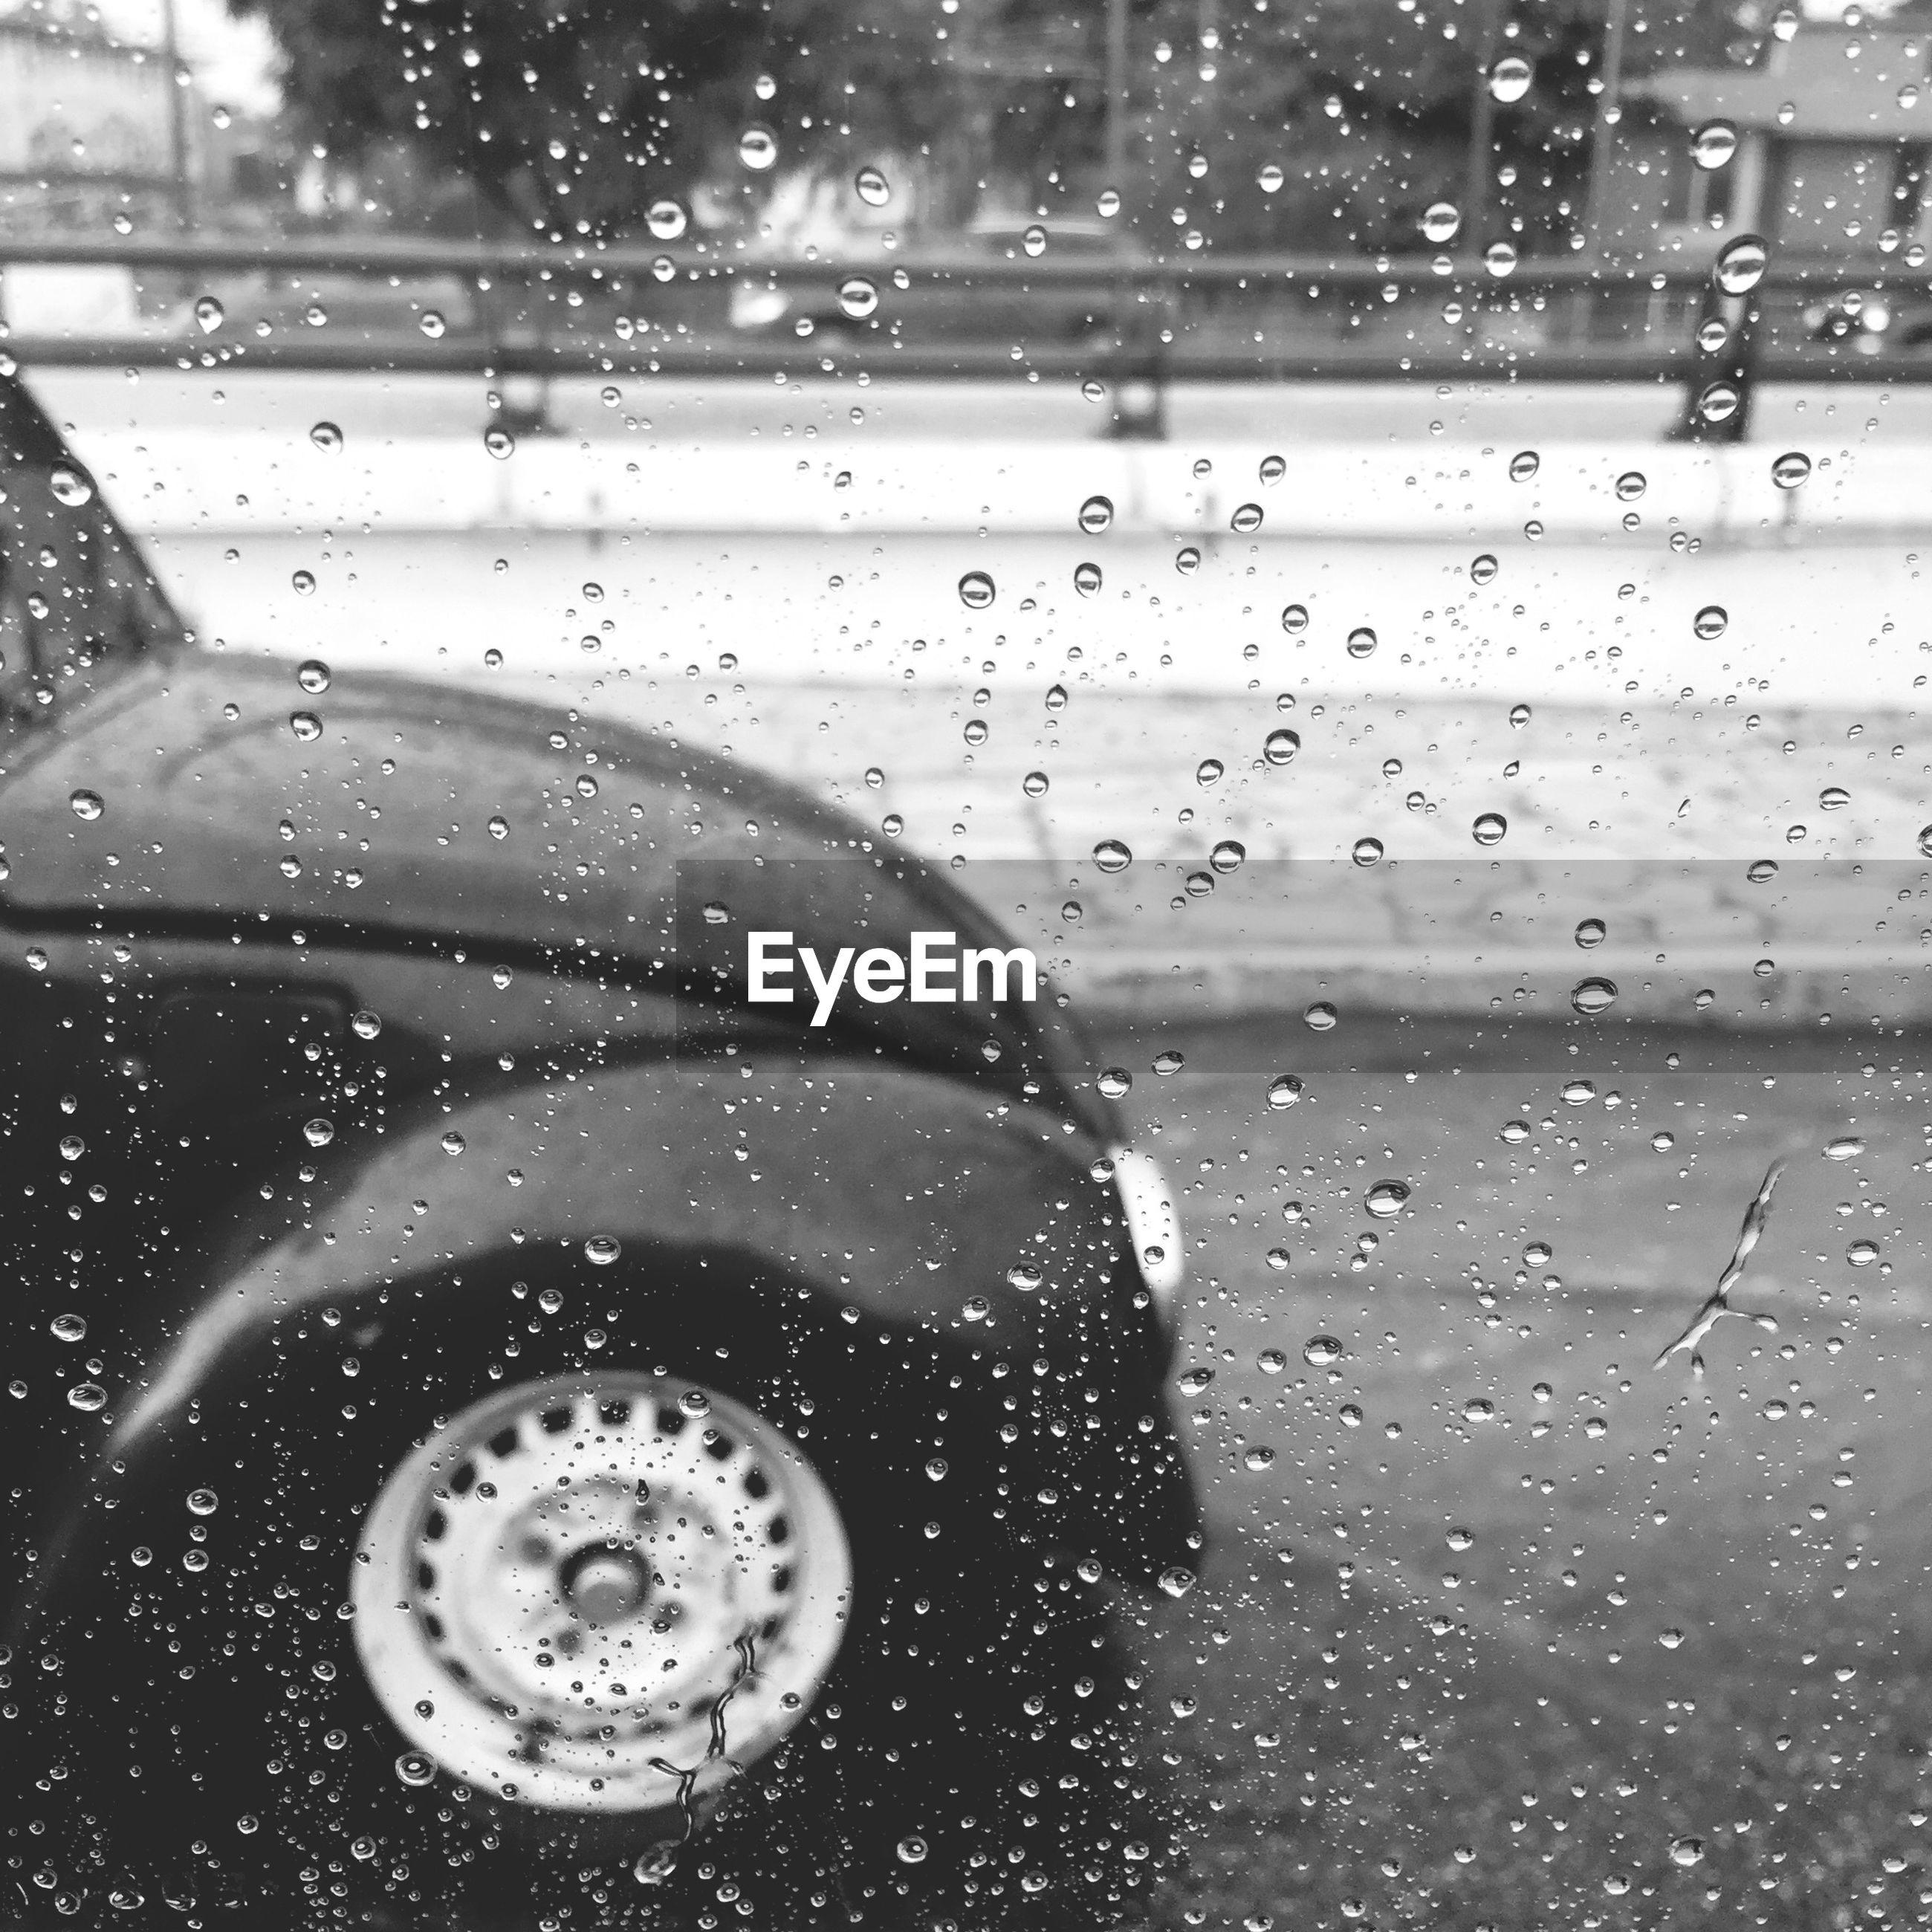 drop, wet, glass - material, transparent, indoors, rain, water, window, car, season, transportation, land vehicle, raindrop, close-up, weather, mode of transport, glass, focus on foreground, reflection, street